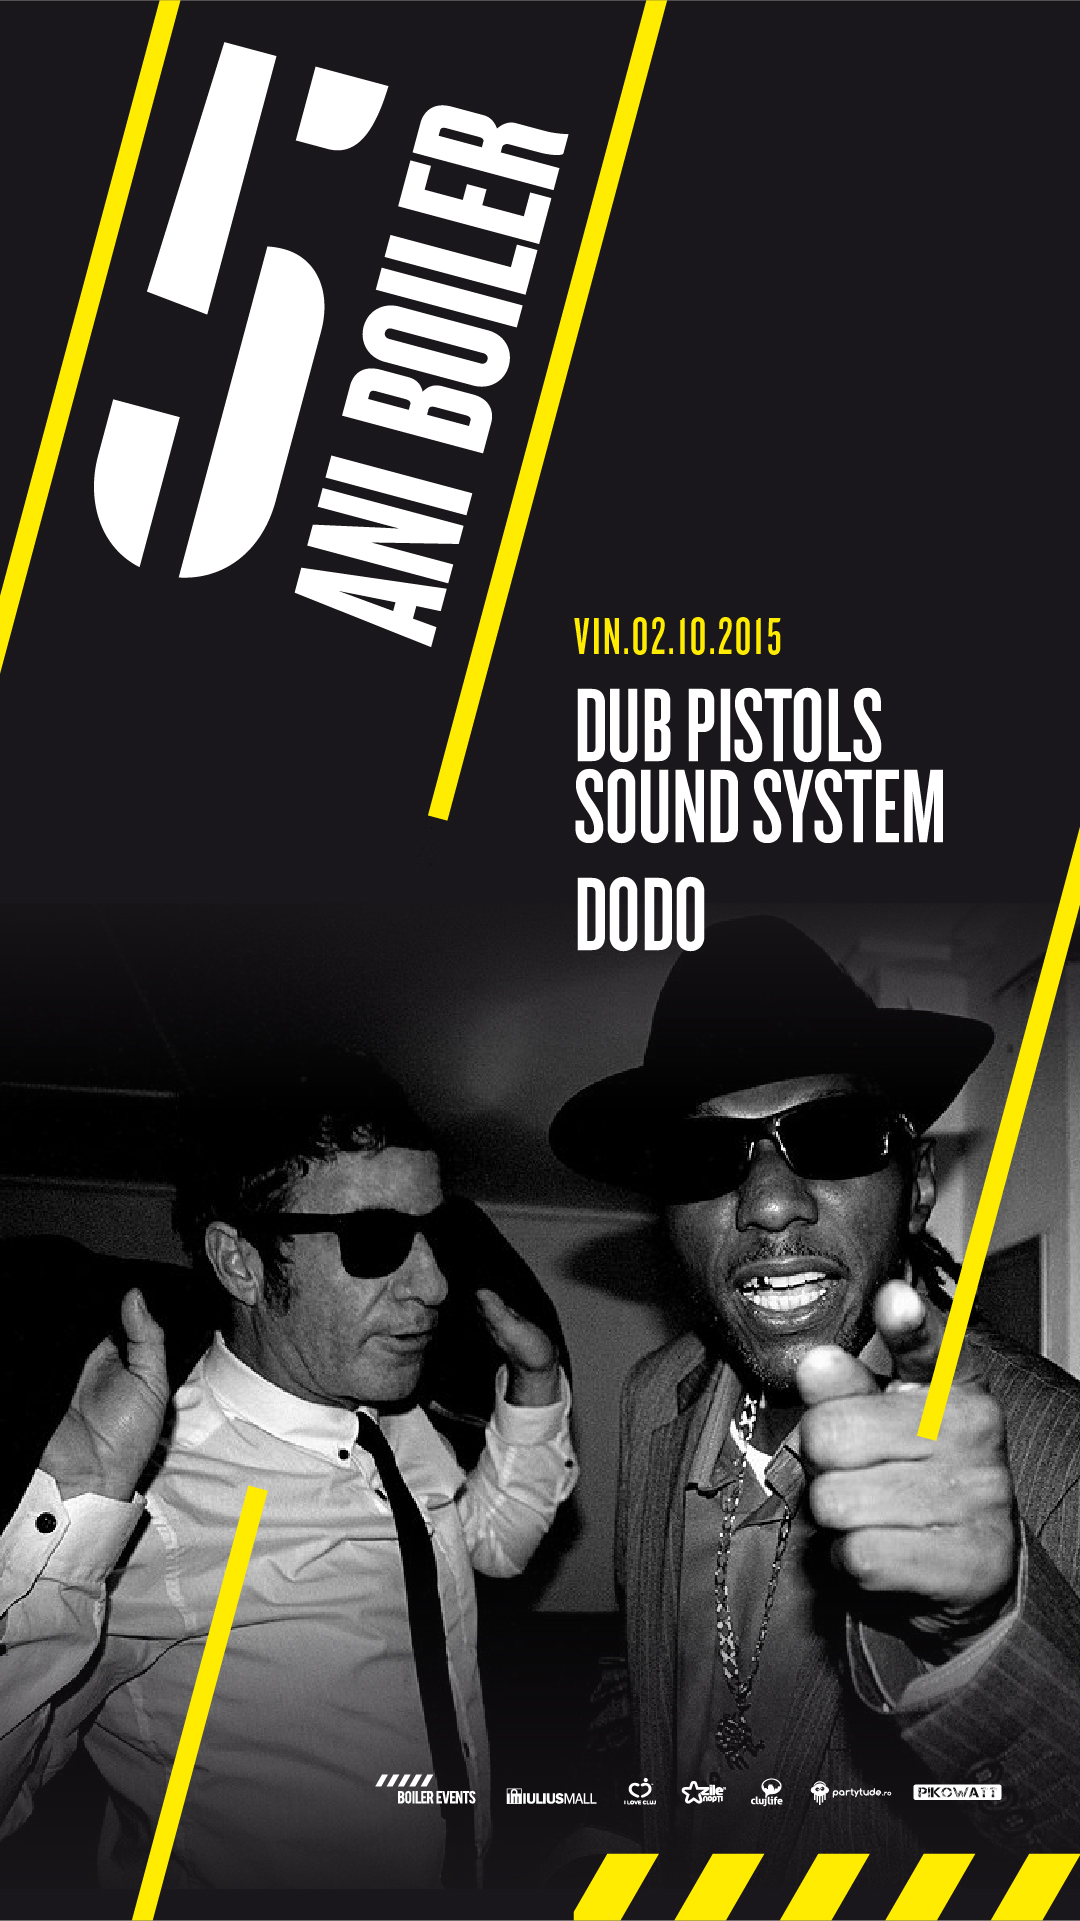 Weekend aniversar w/ Dub Pistols Sound System @ Boiler Club